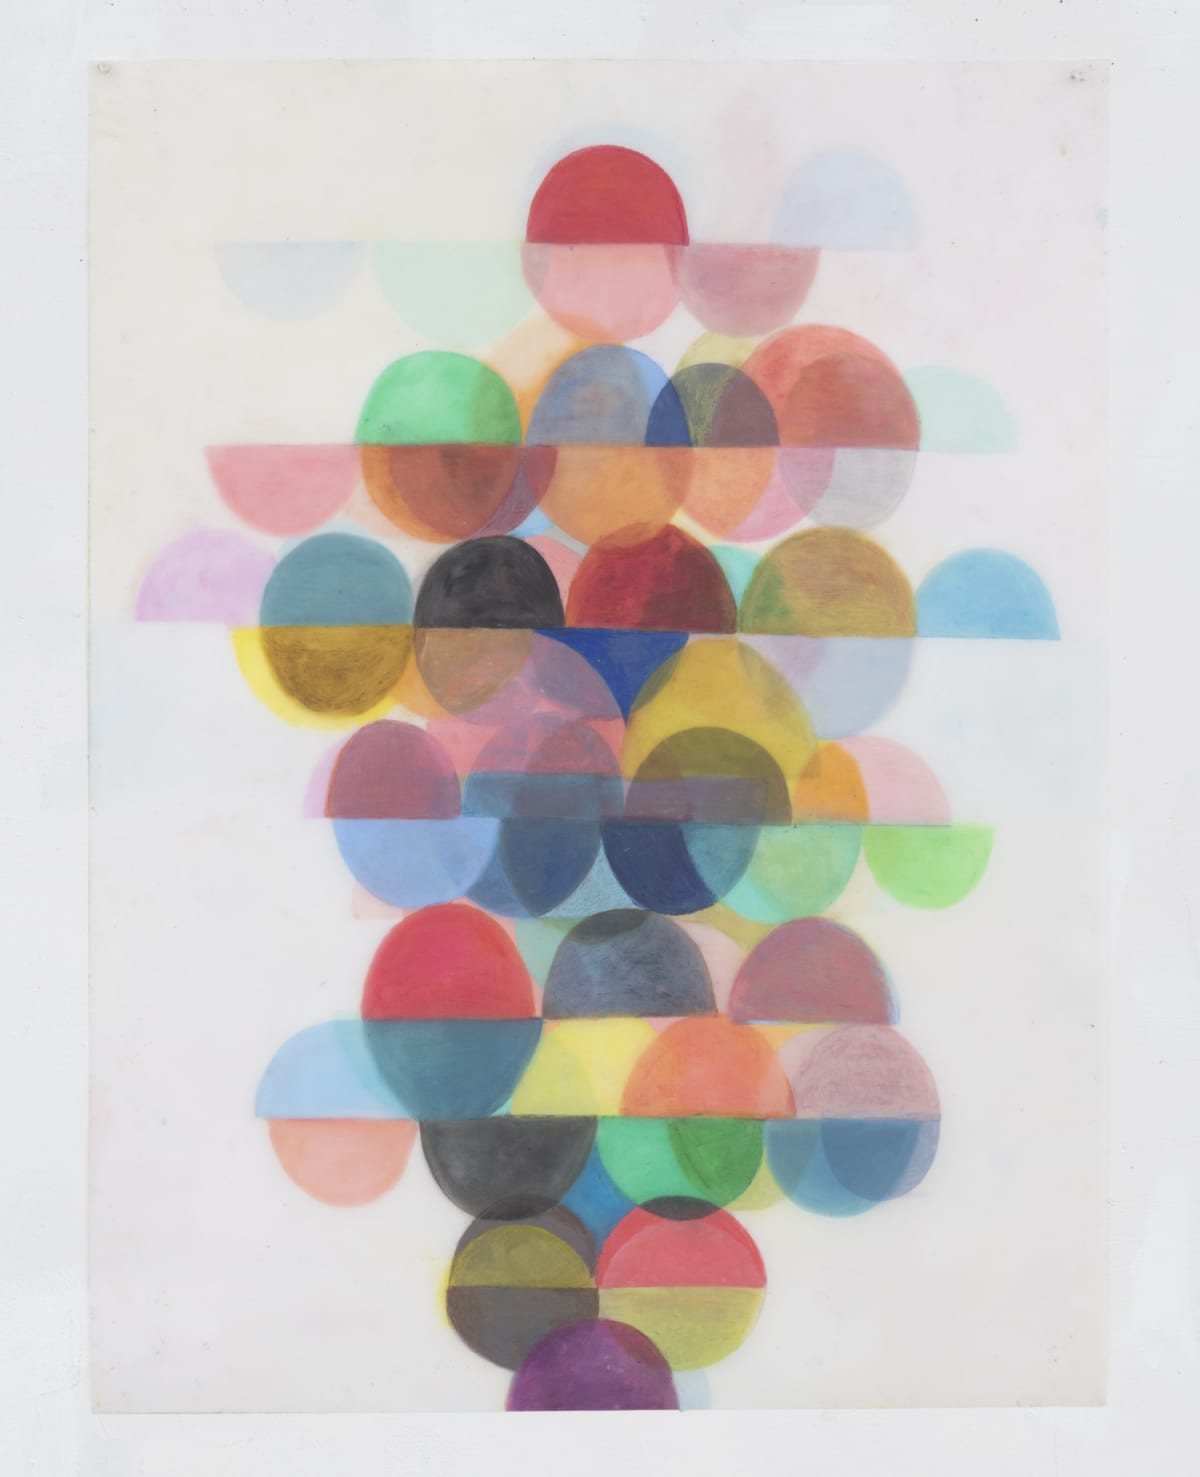 Vicki Sher, Untitled 3, 2019